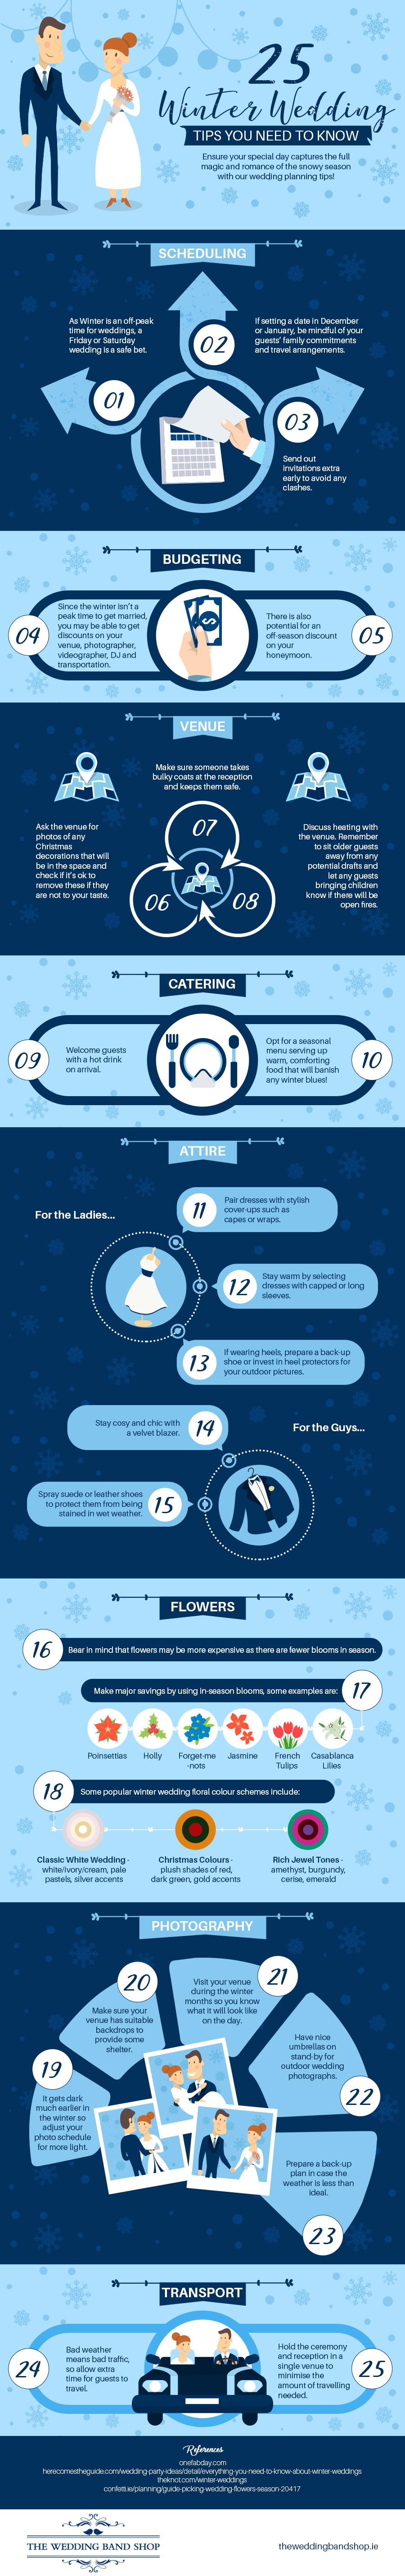 25 Winter Wedding Tips